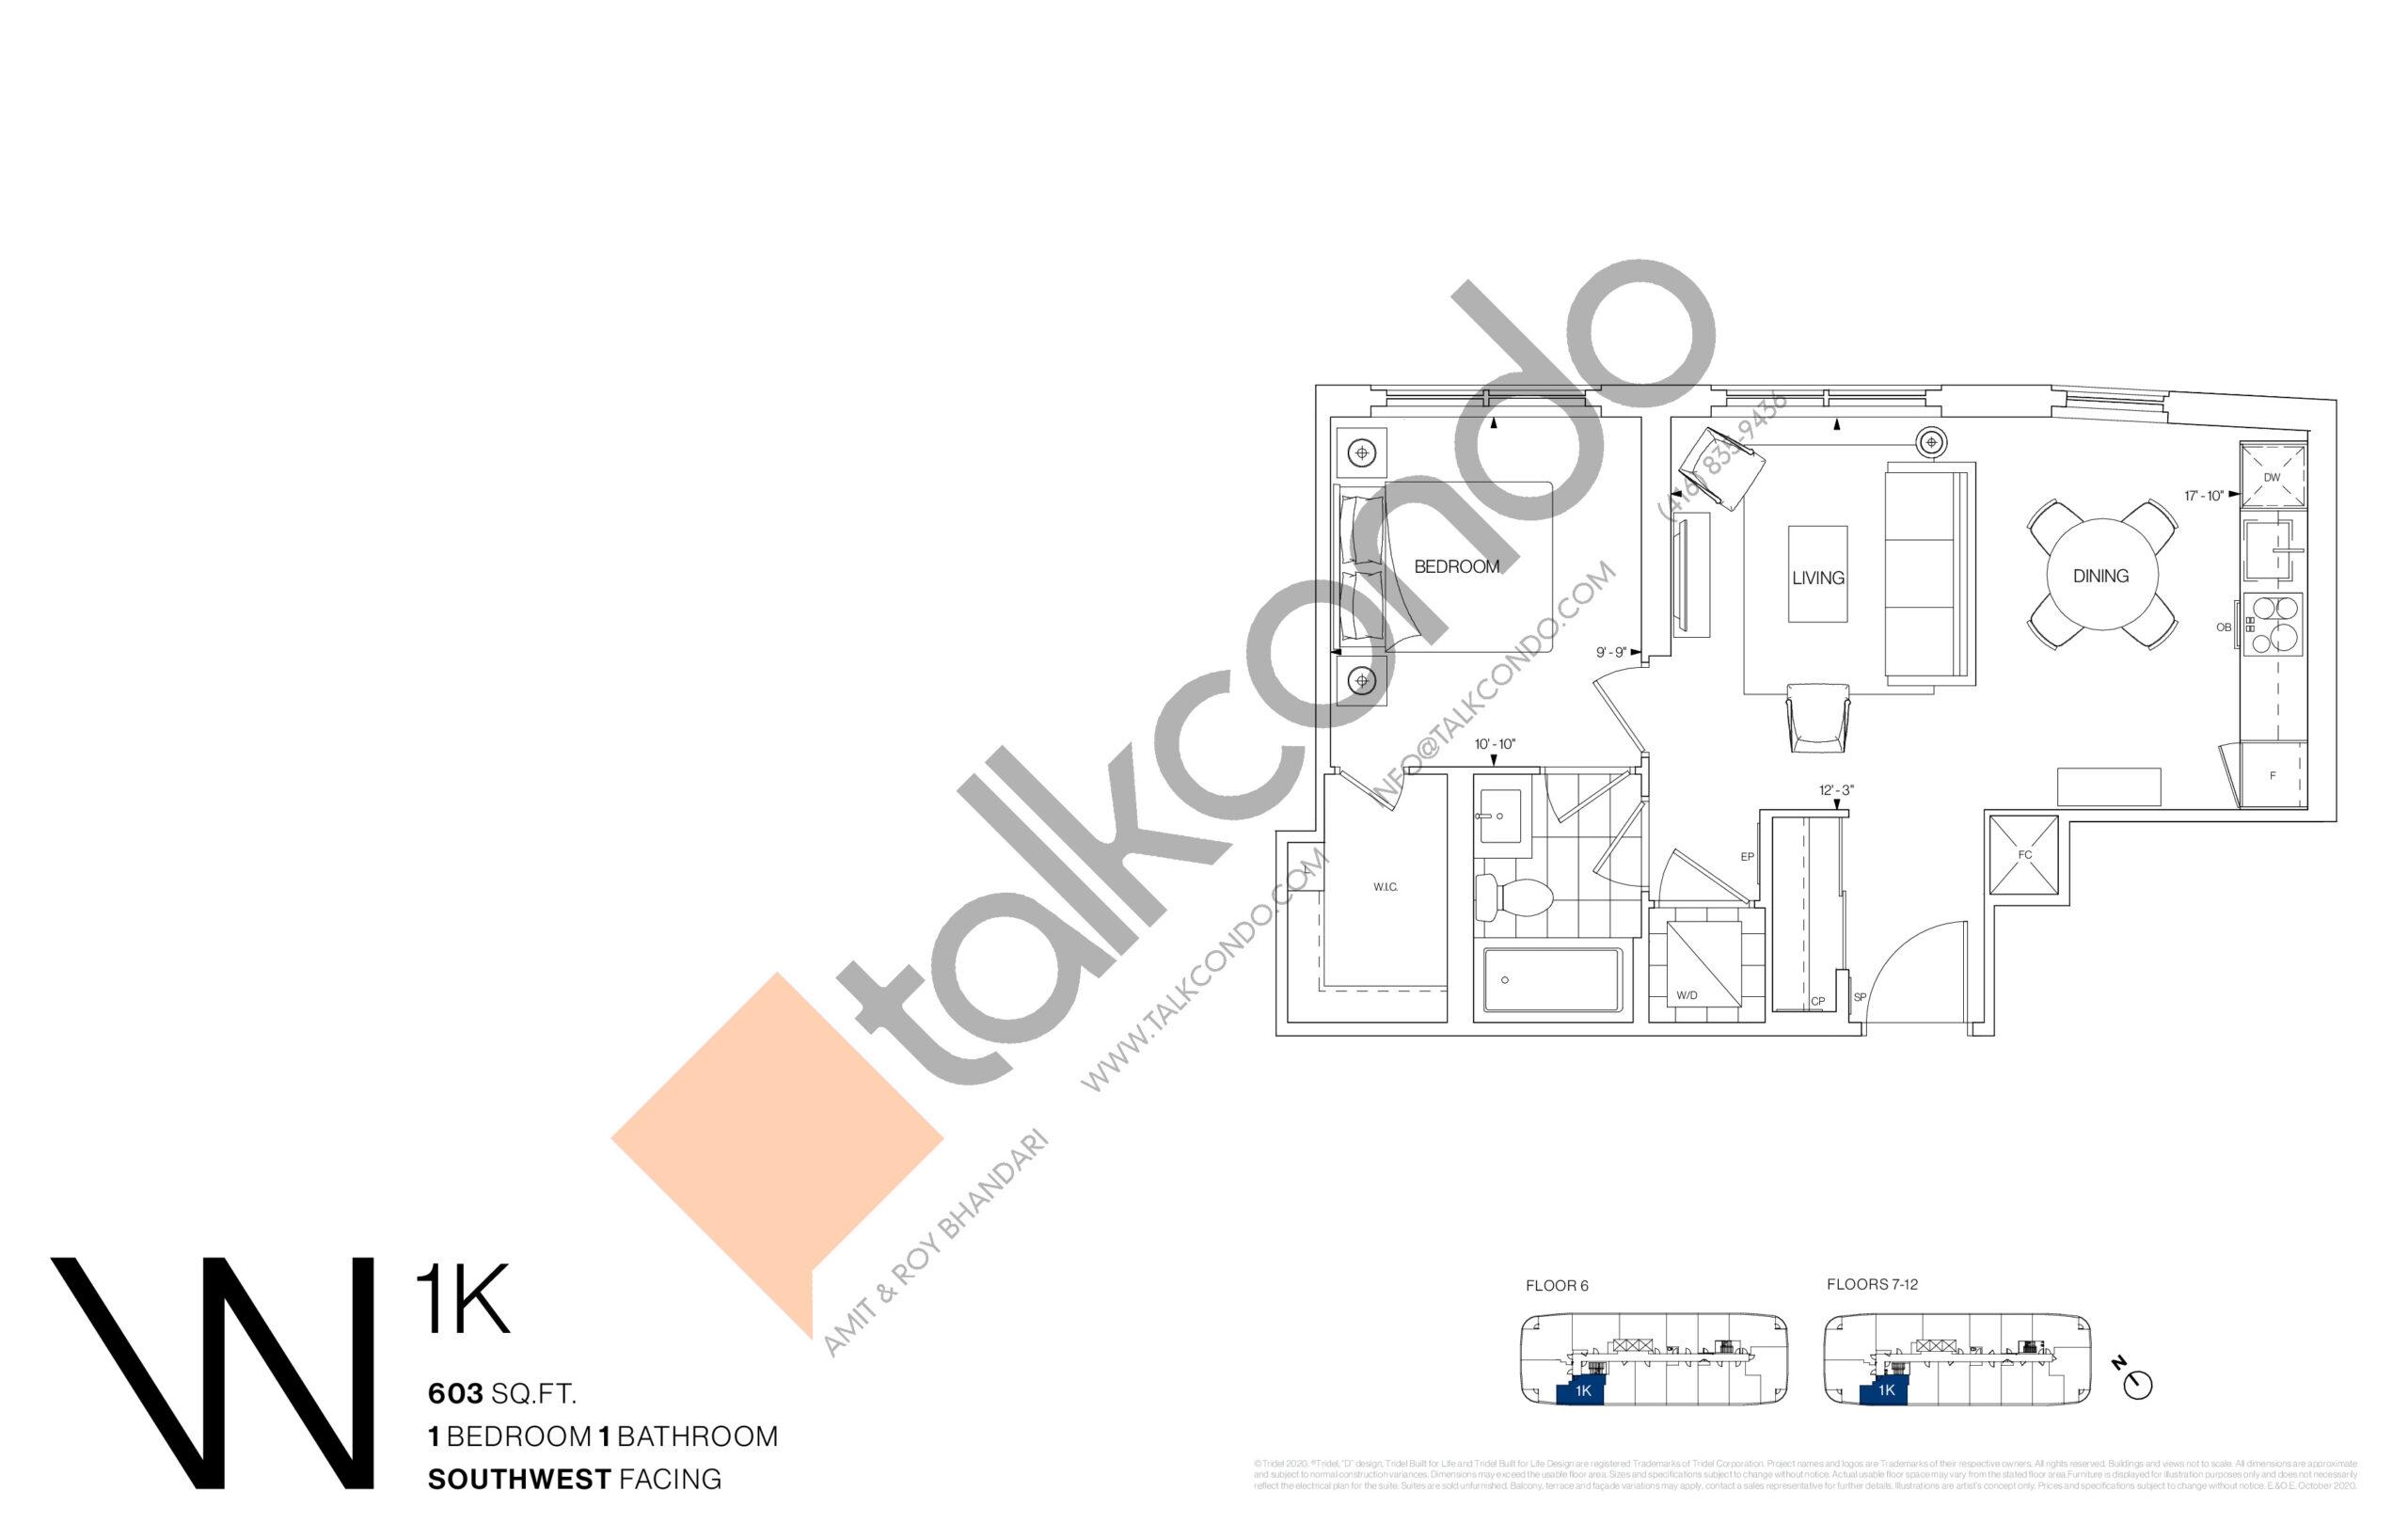 1K Floor Plan at Westerly Condos - 603 sq.ft